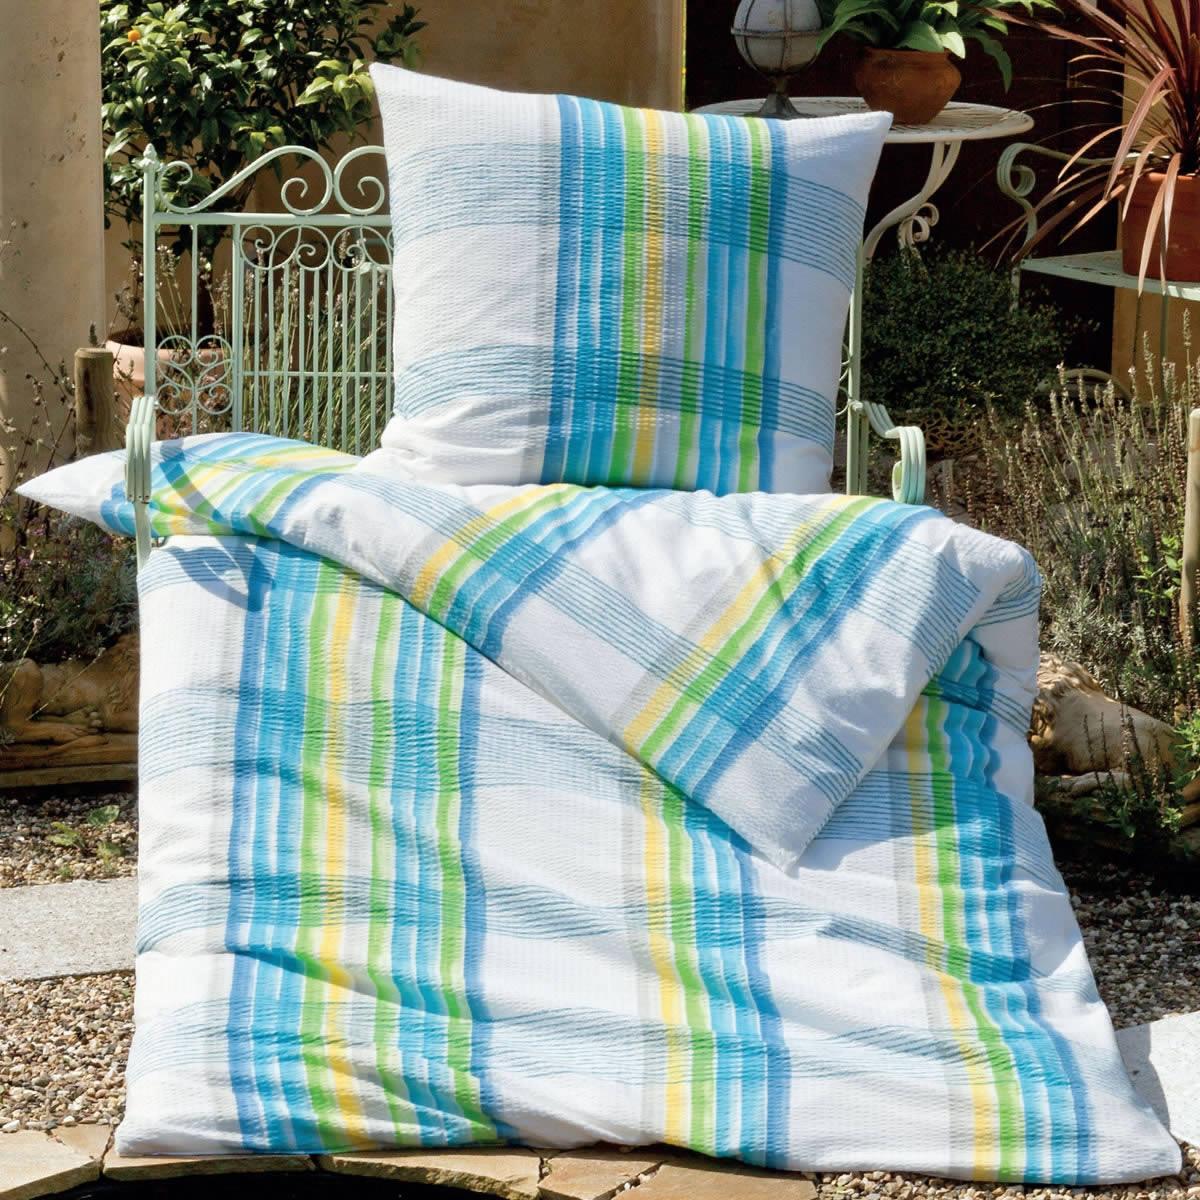 janine mako soft seersucker bettw sche in 155x220 cm 1b ware 2421 02. Black Bedroom Furniture Sets. Home Design Ideas